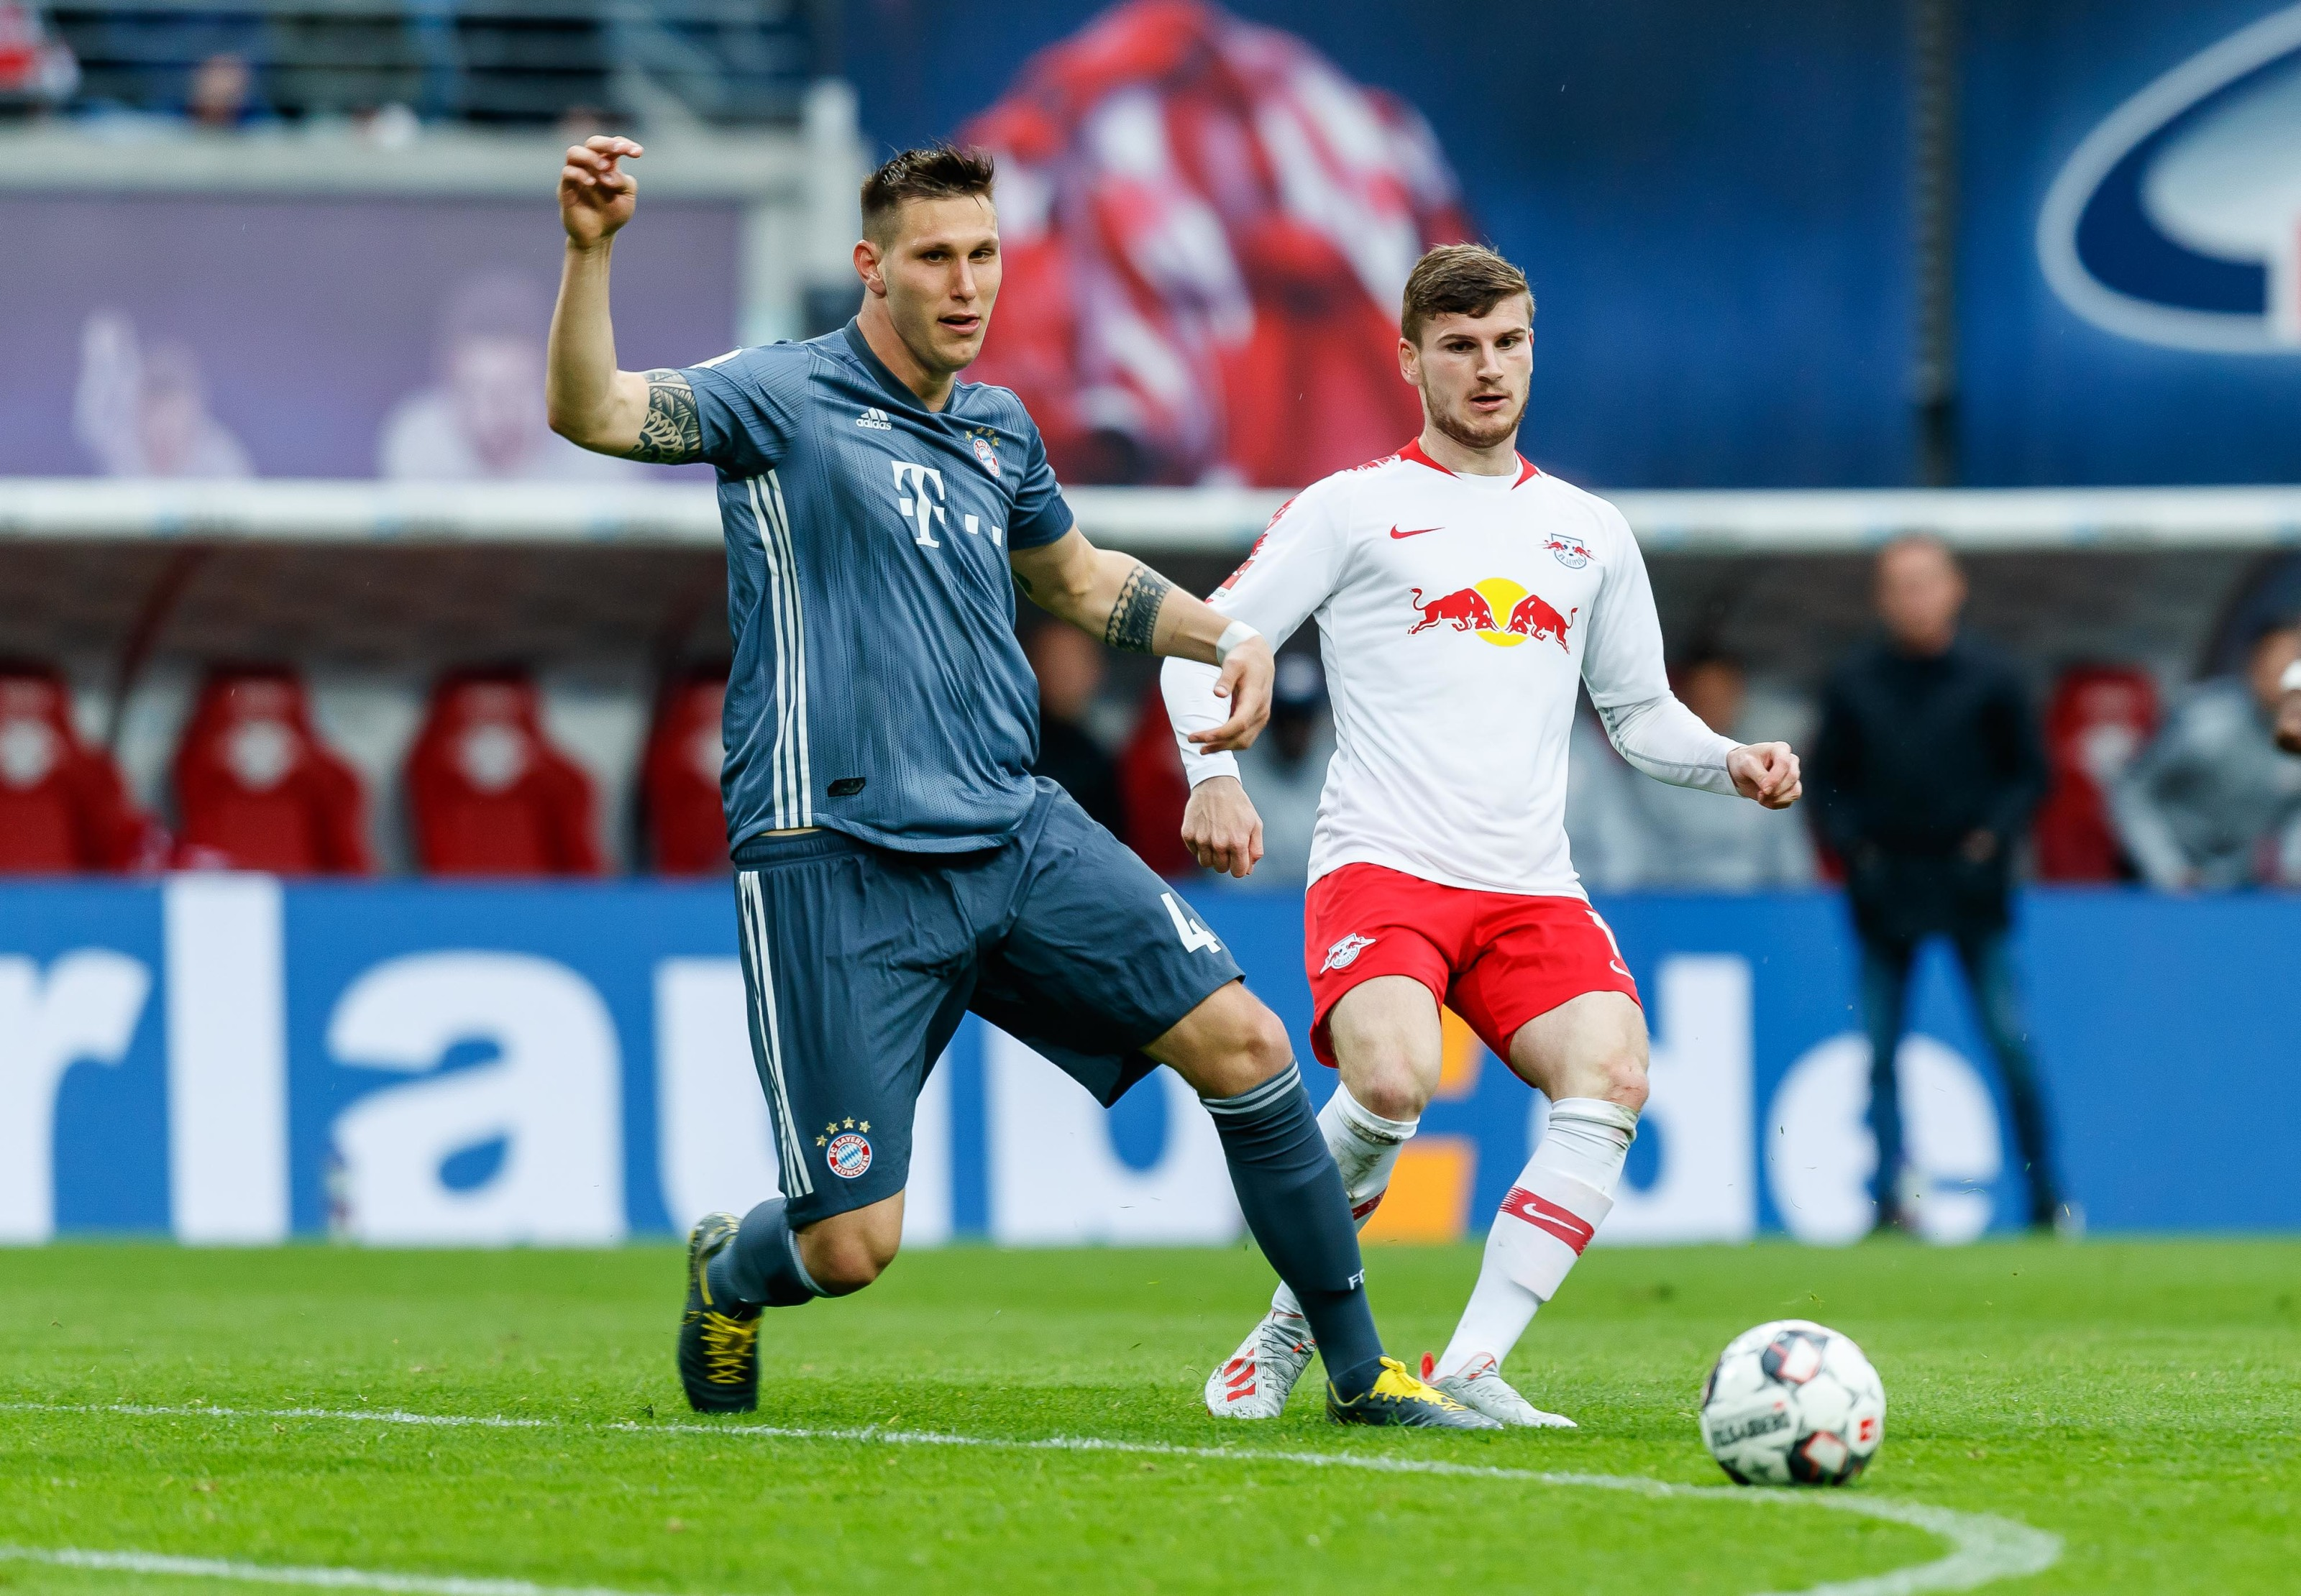 Rb Bayern Dfb Pokal